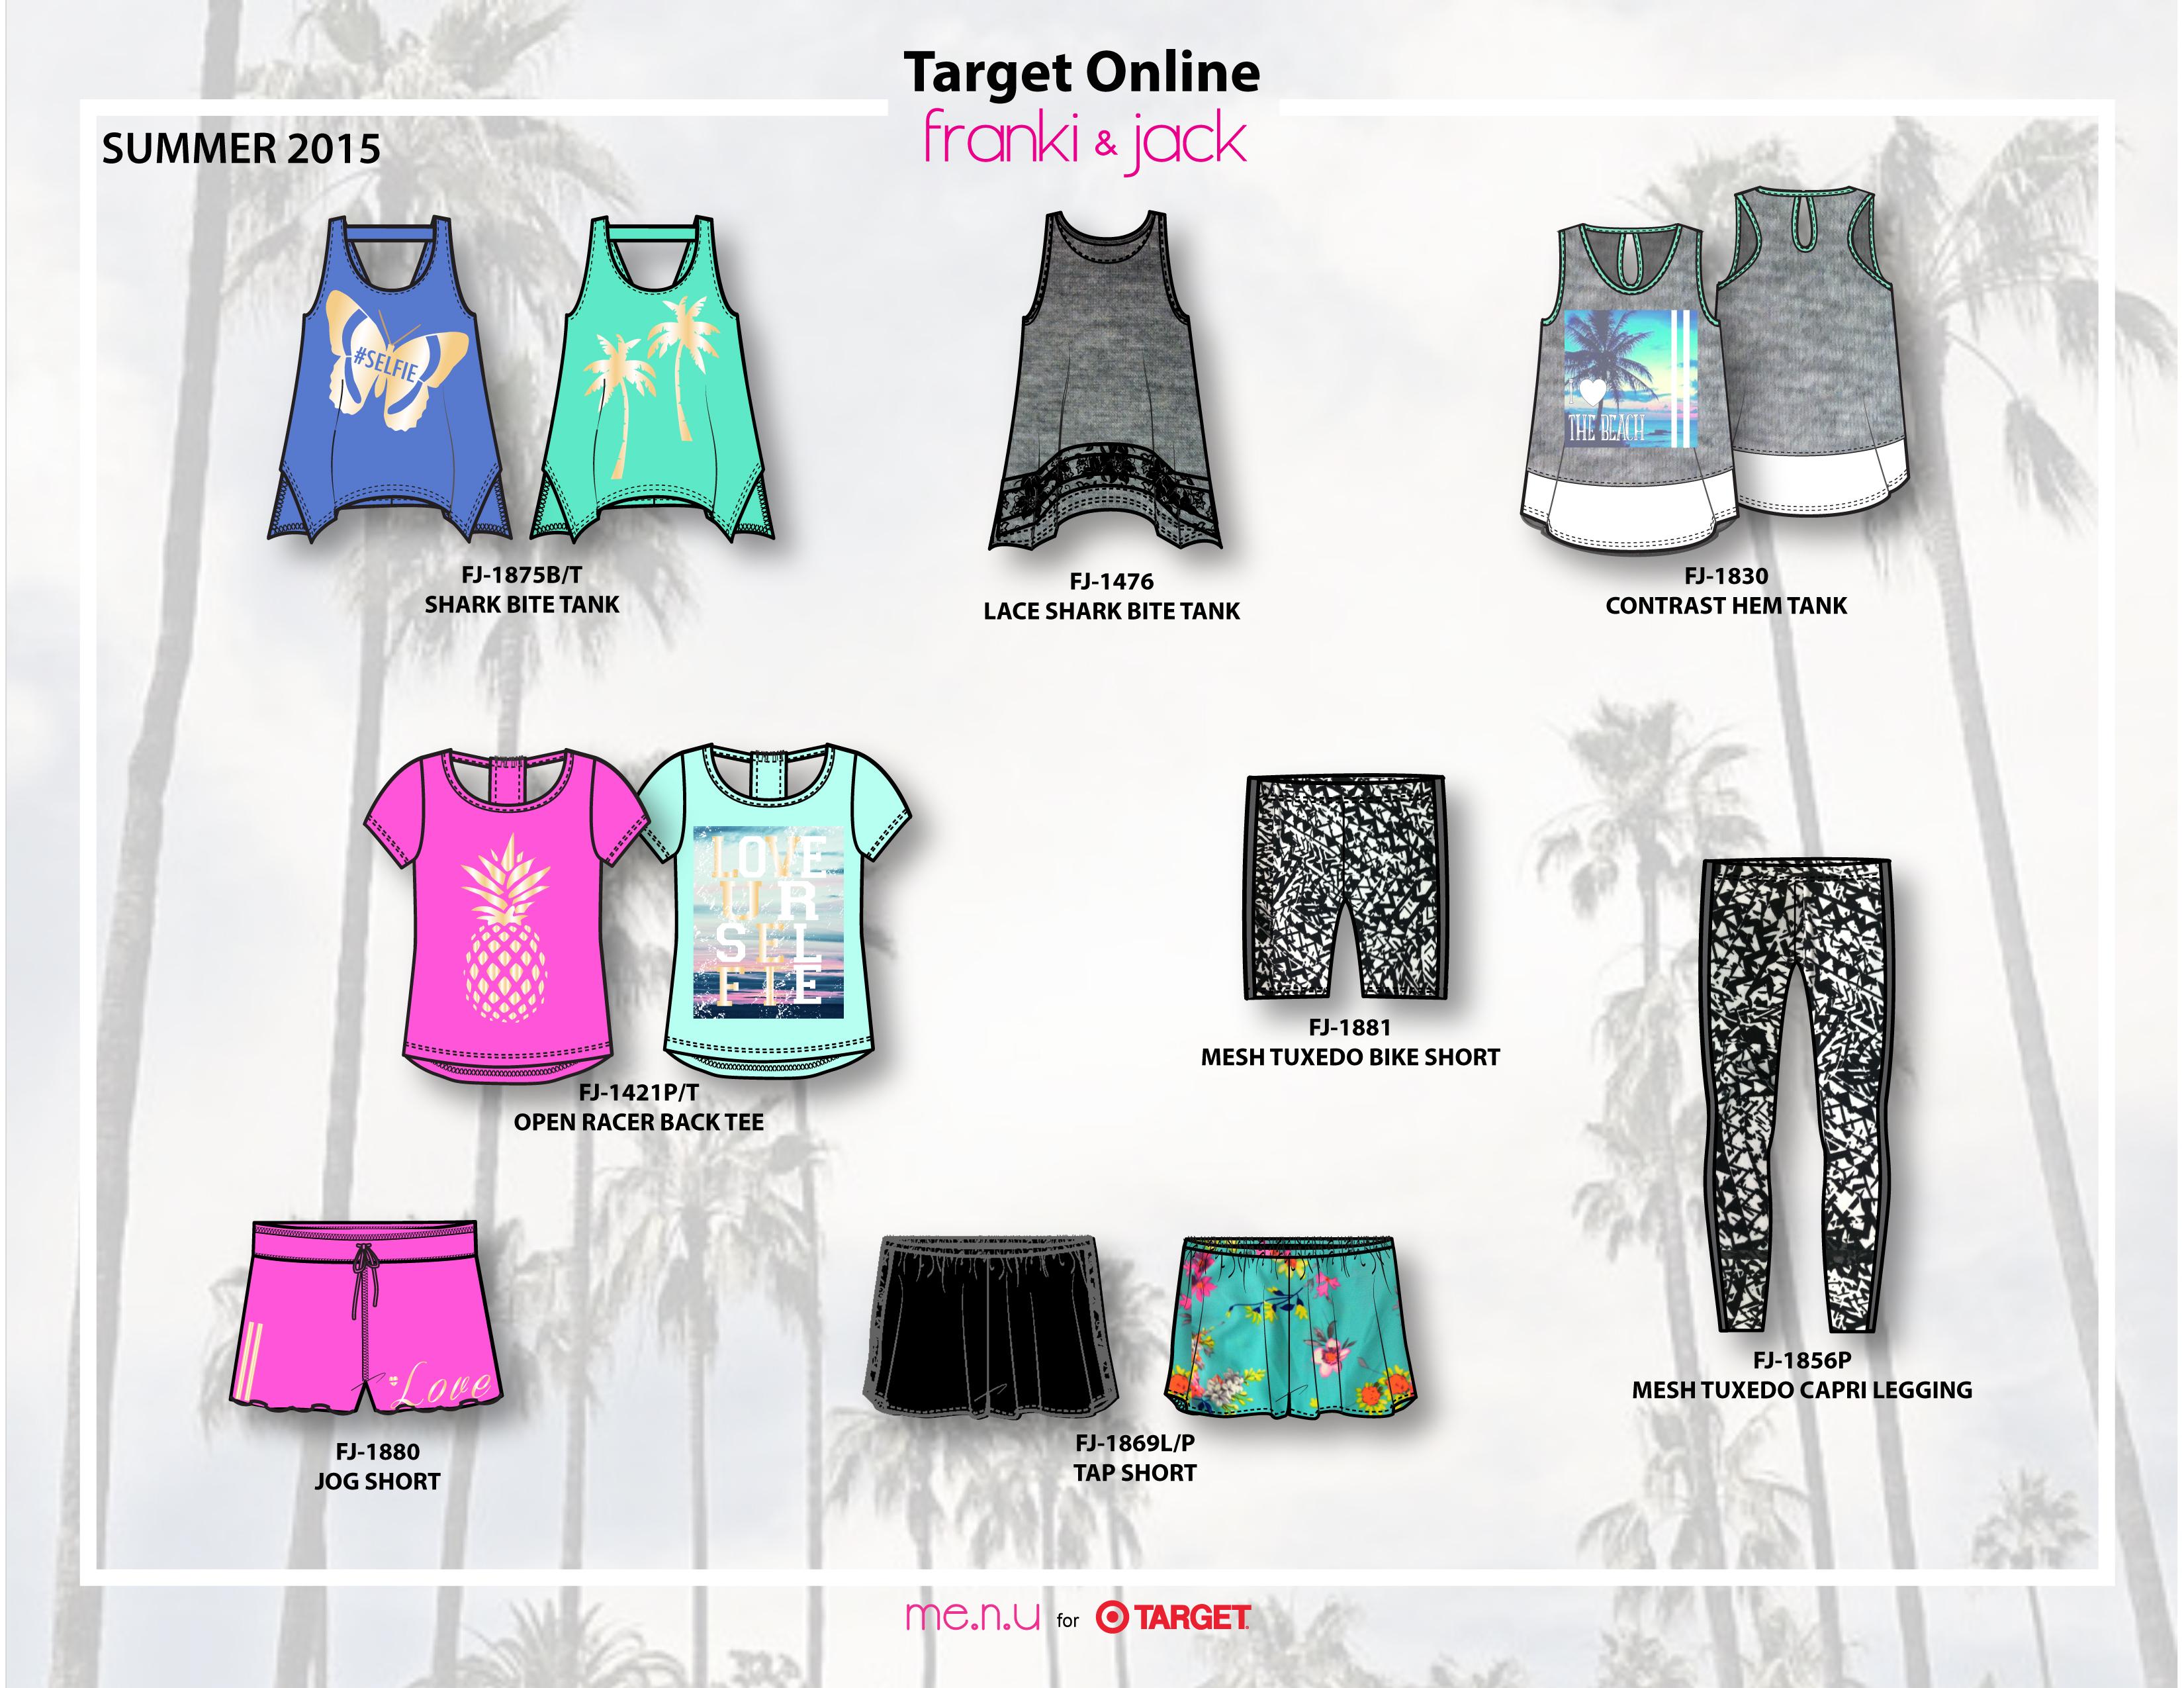 Me.n.u for Target Online Summer 2015